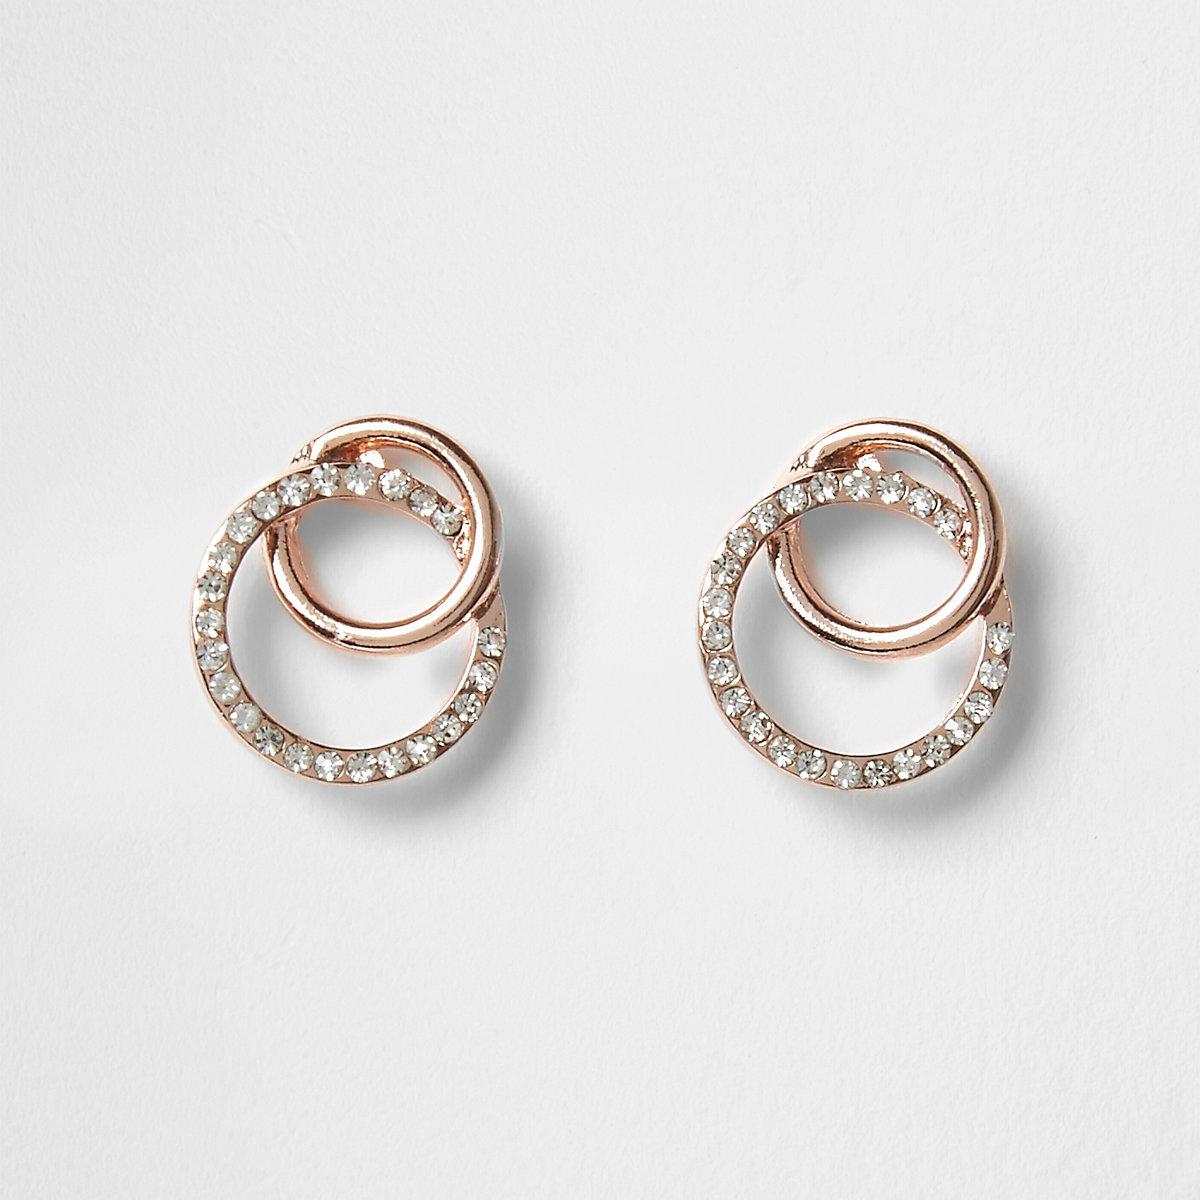 Rose gold interlocking diamante earrings